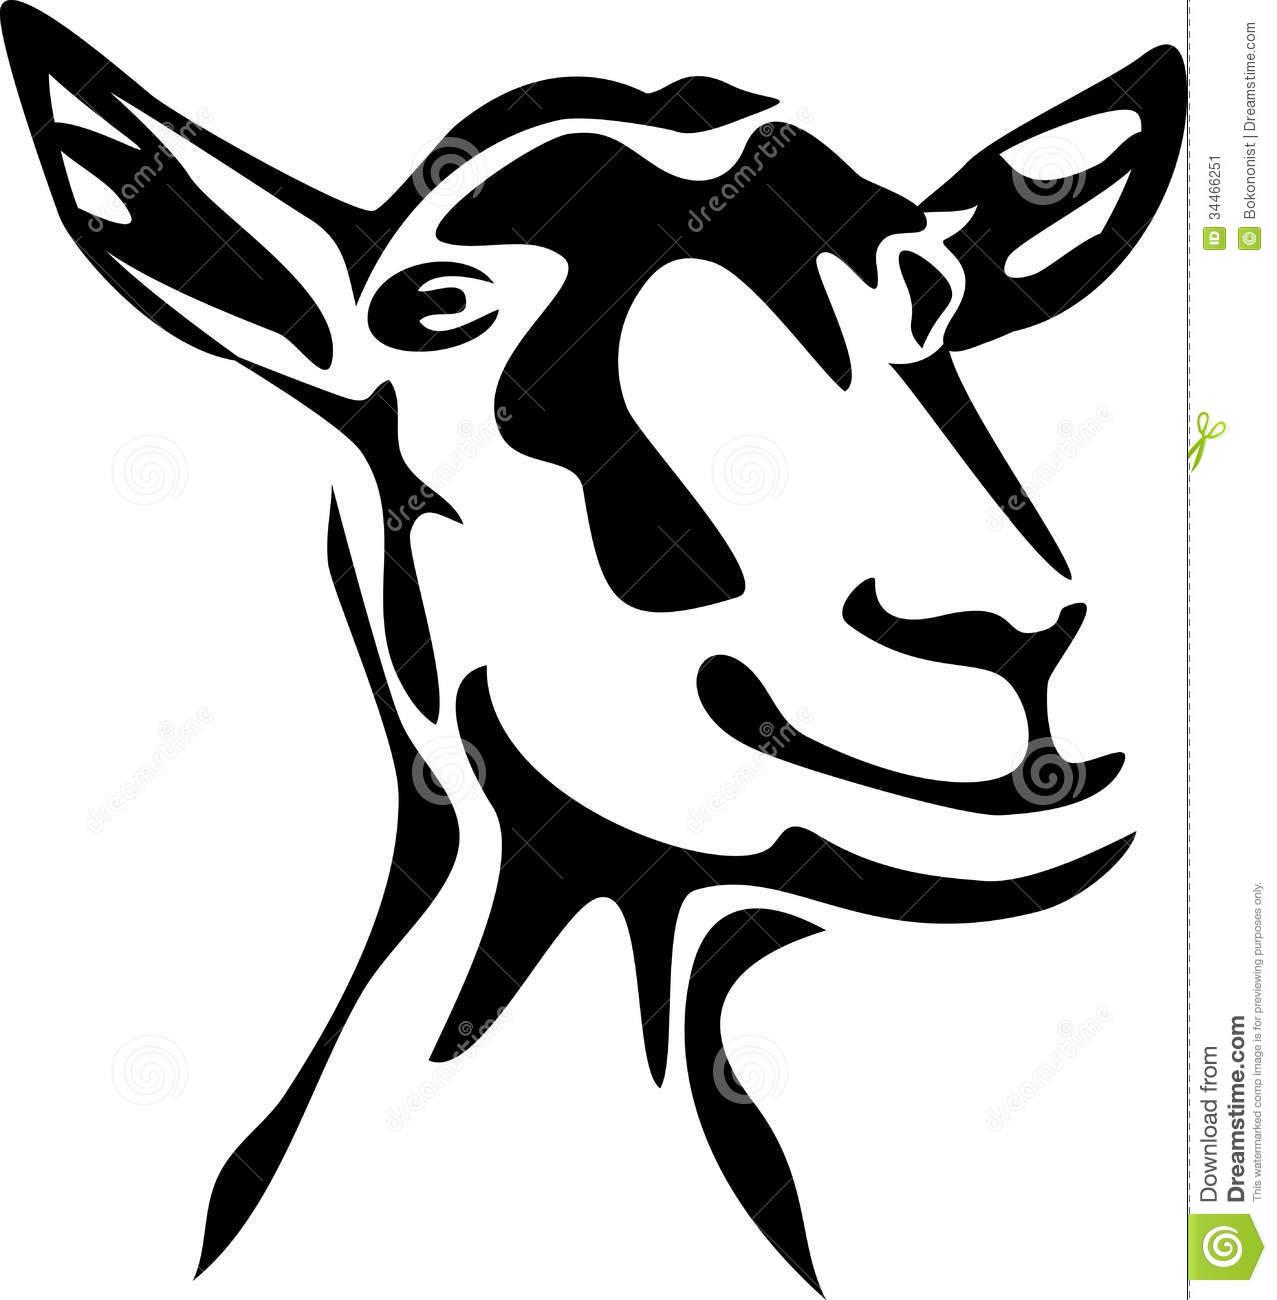 1277x1300 Silhouette Of Goat Stock Photos